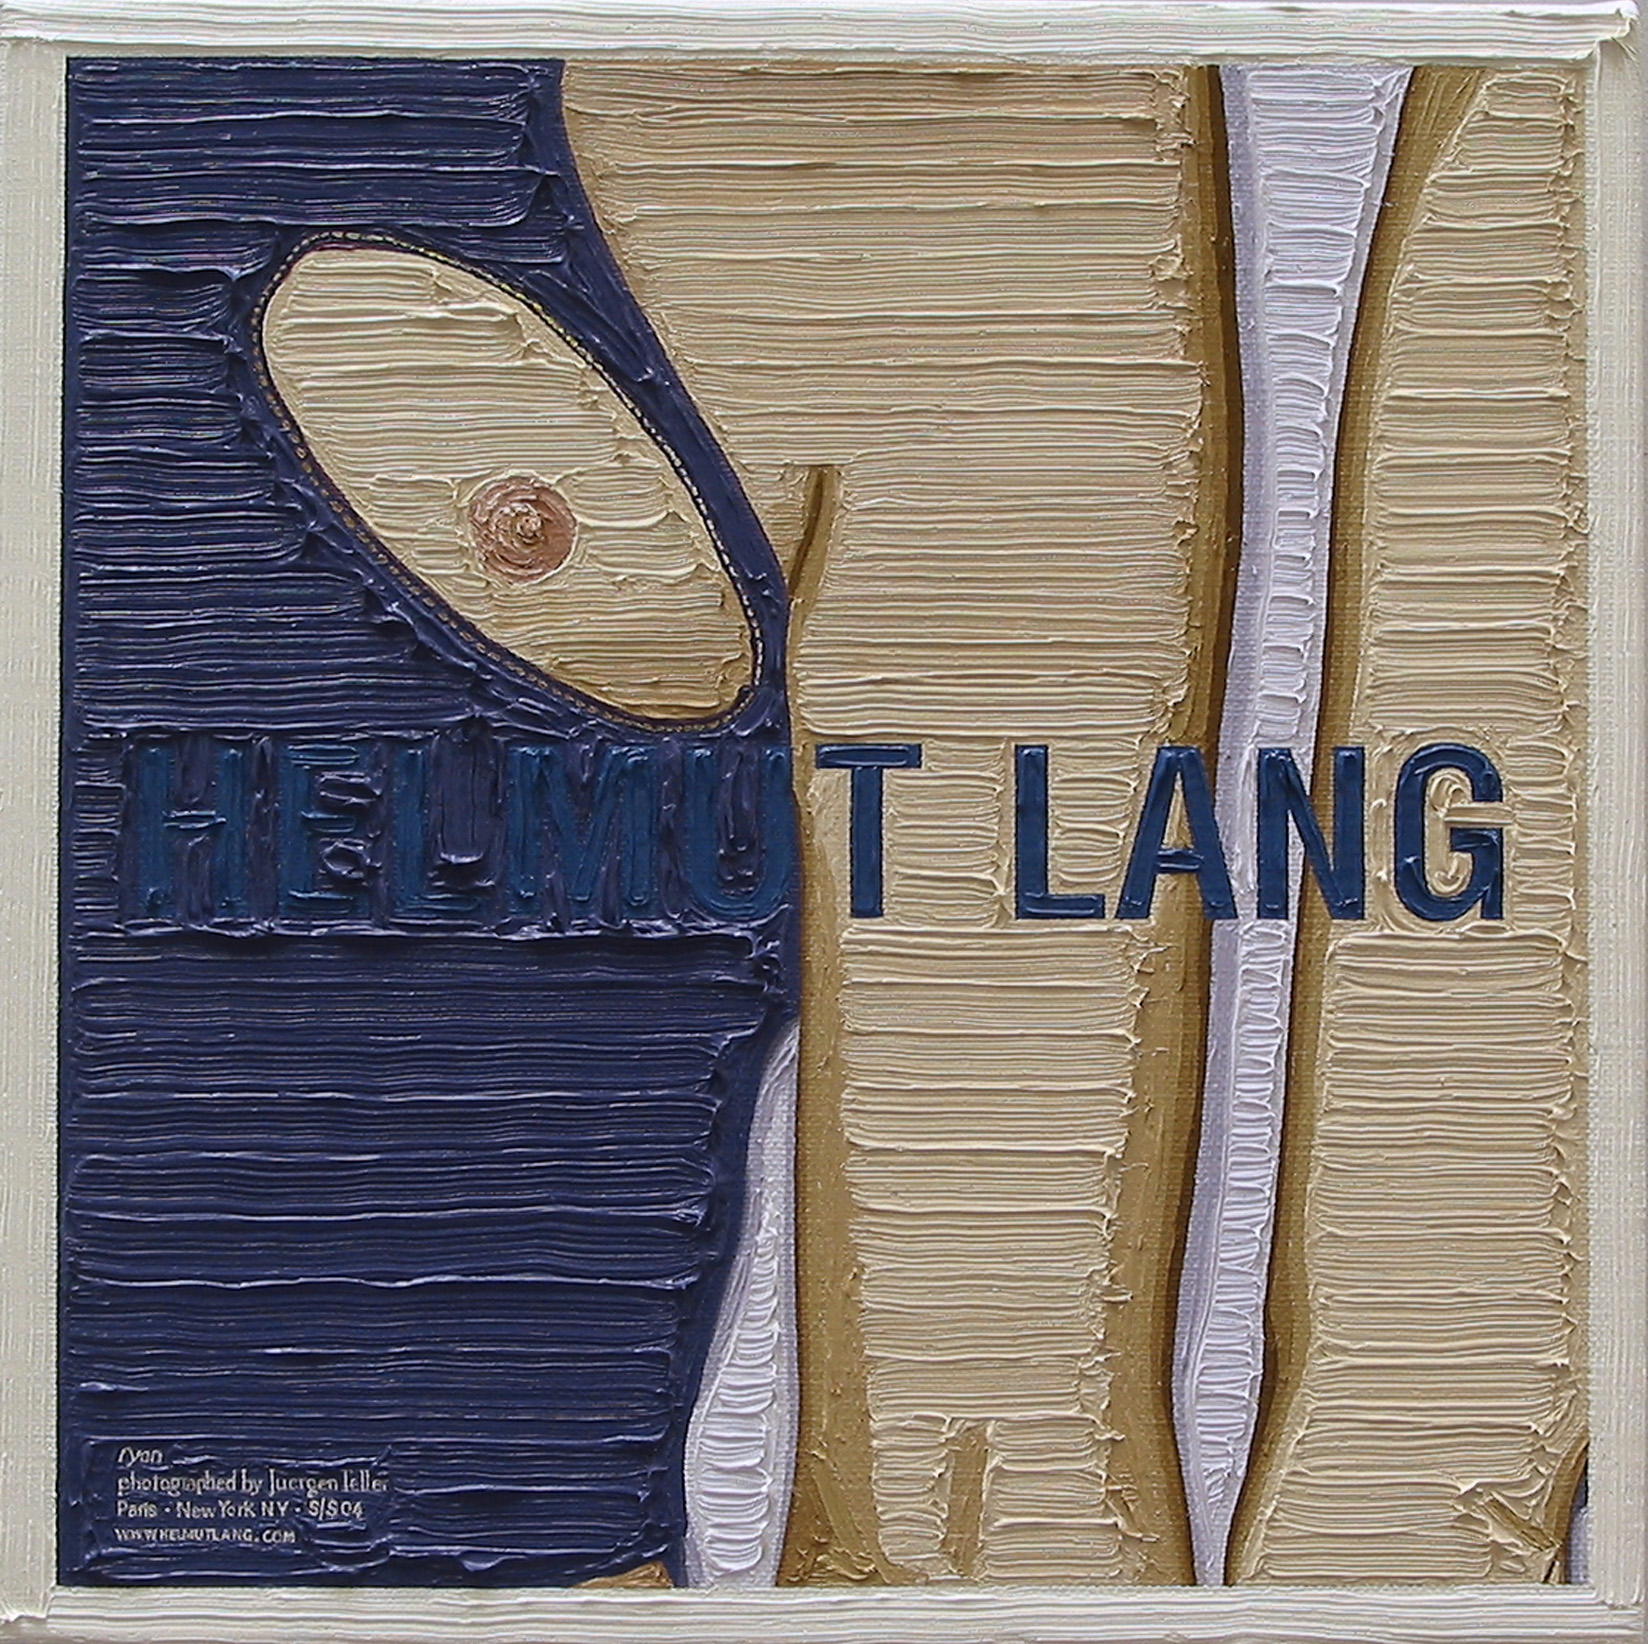 Helmut Lang, Artforum (exposed)